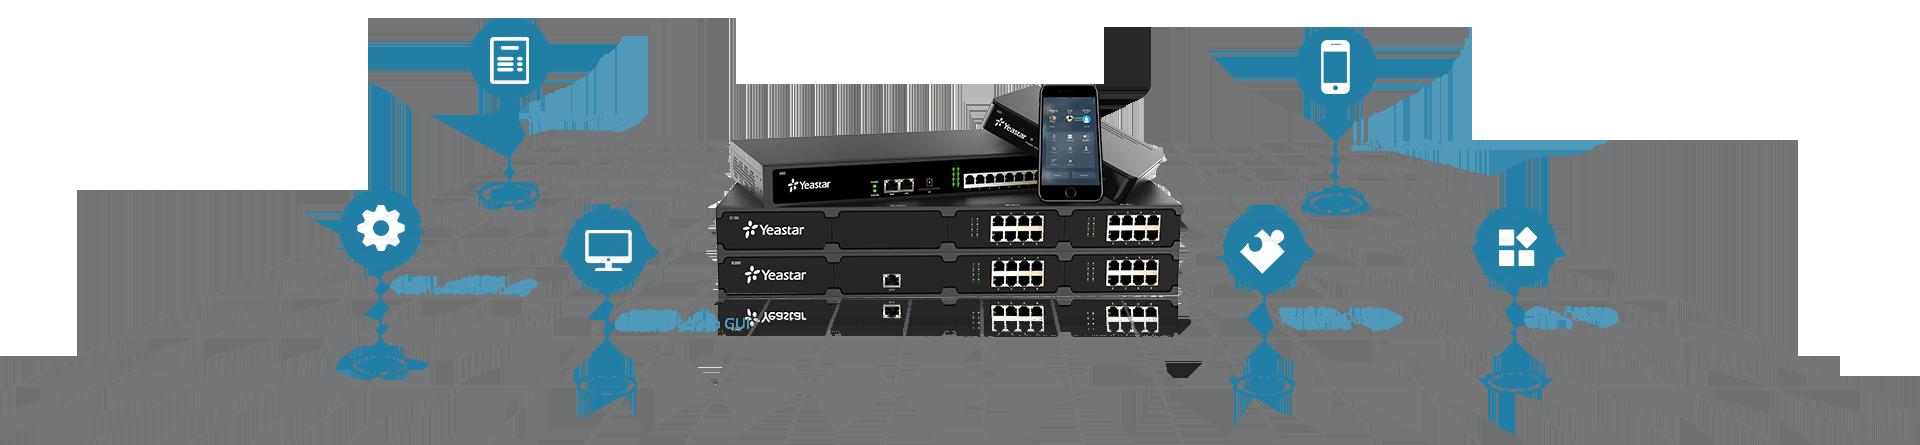 S-Series VoIP PBX